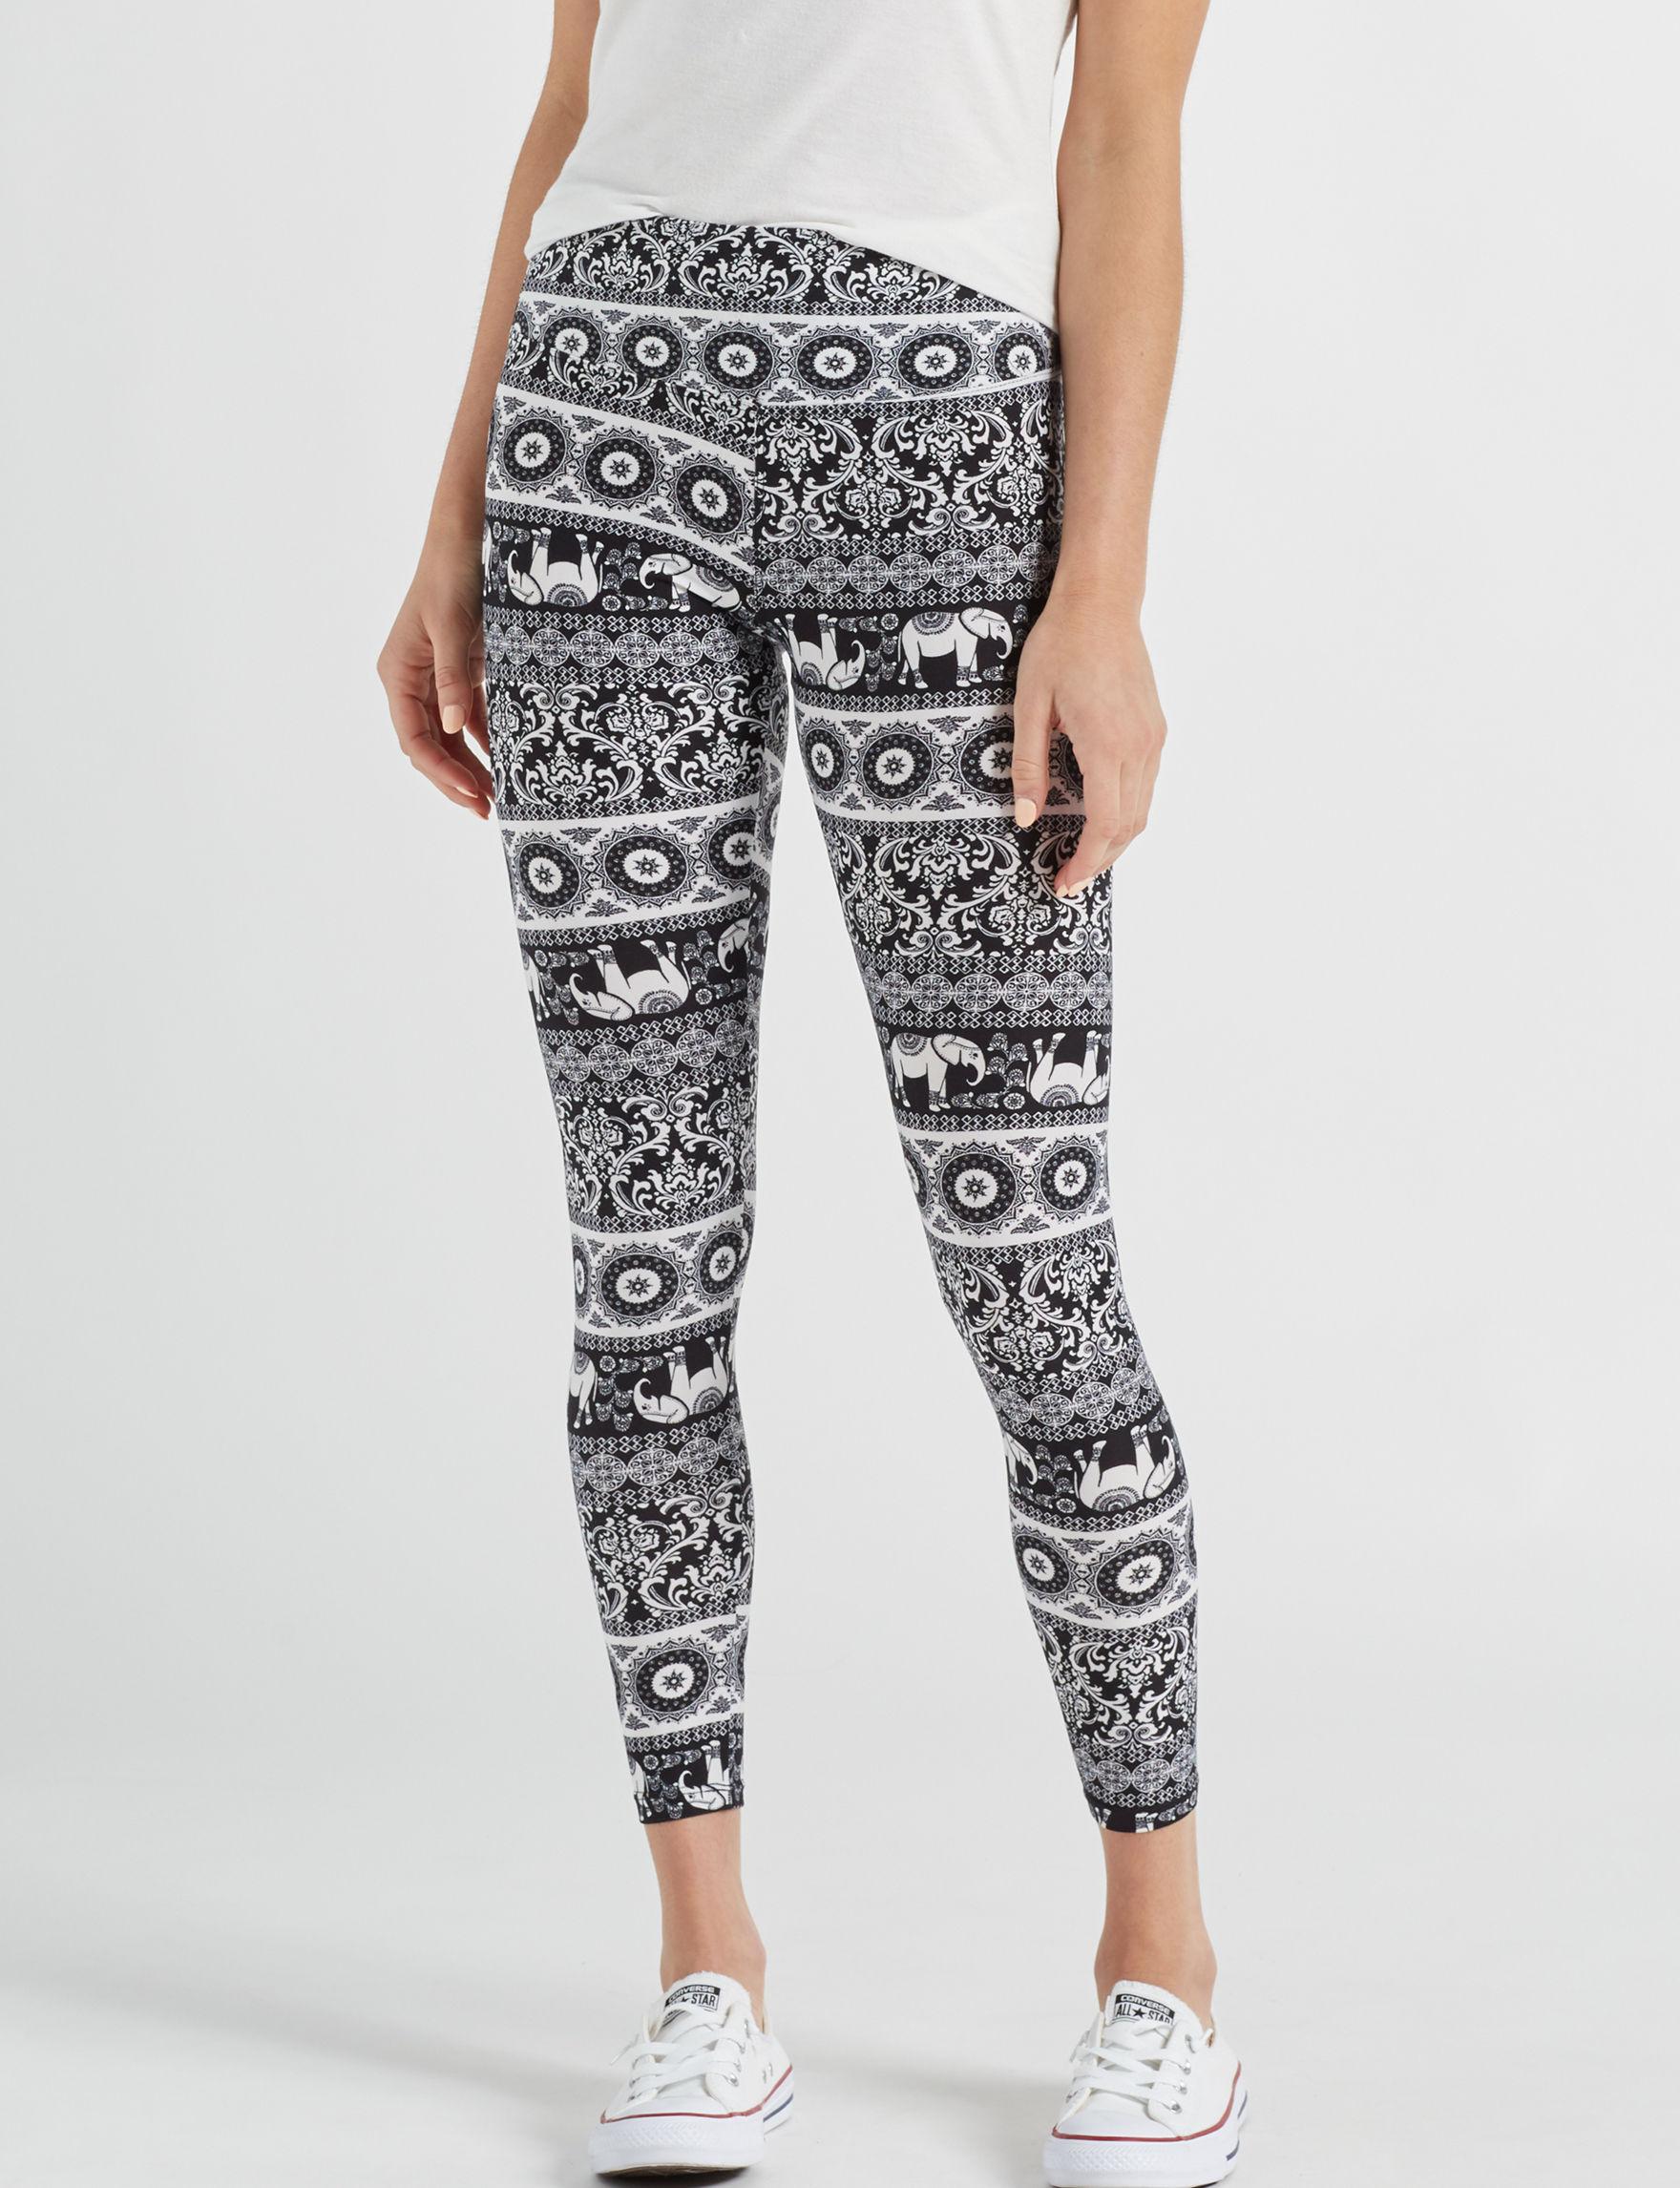 Justify Black / White Soft Pants Stretch